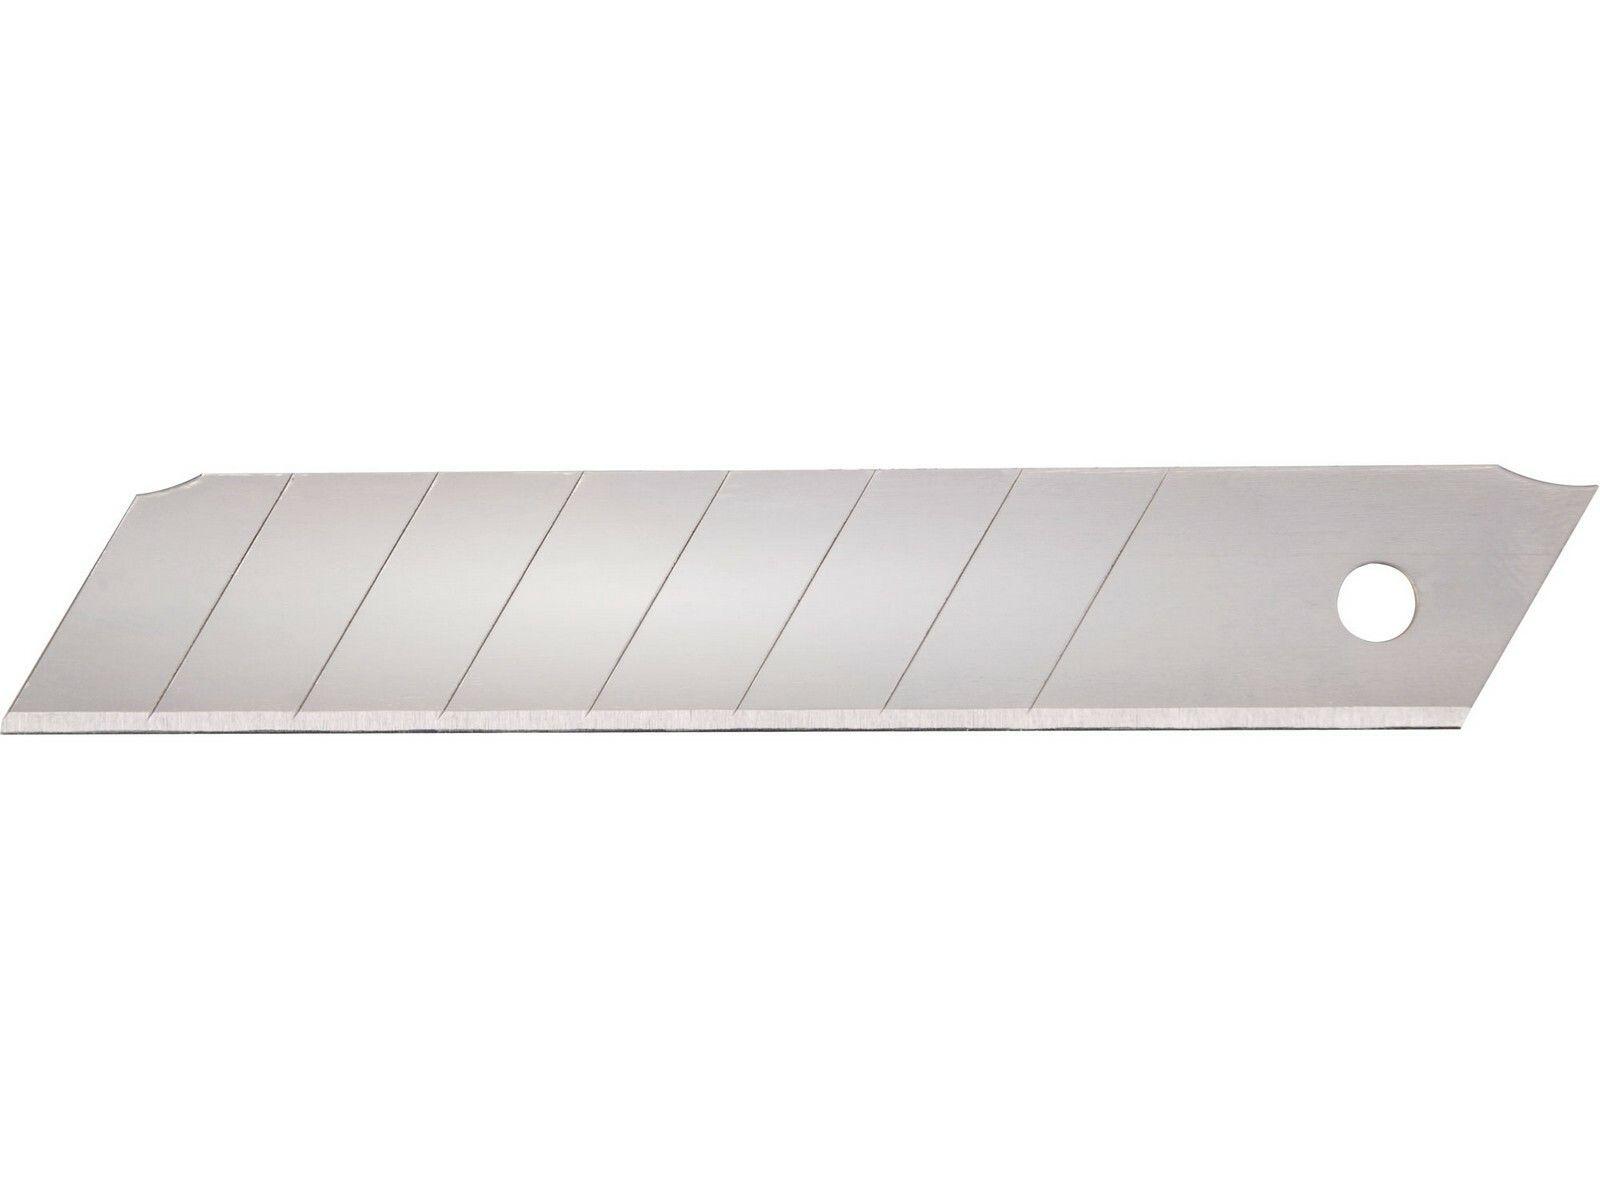 Břity ulamovací do nože, 18mm, 10ks, SK4 EXTOL PREMIUM